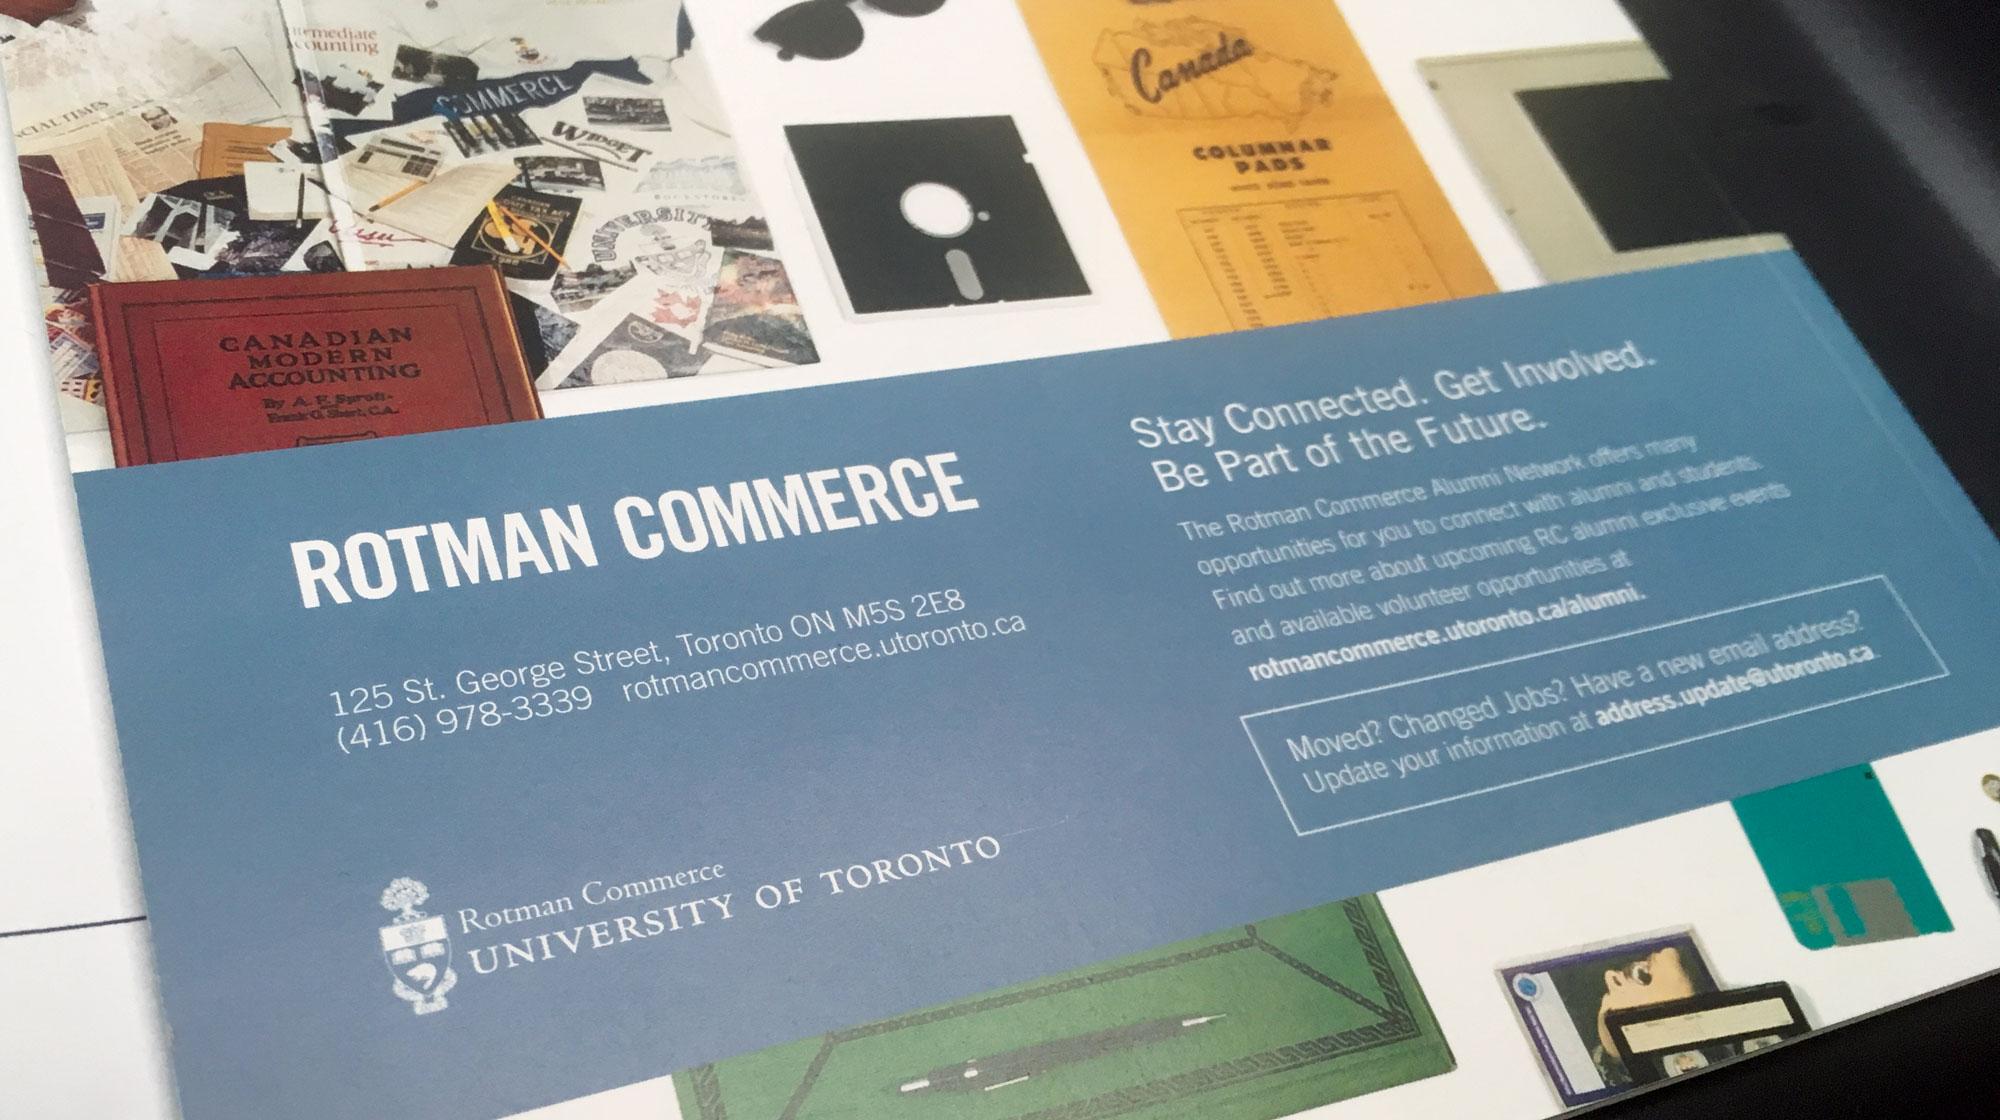 Broken-Fence-Robyn-Colangelo-RotmanCommerce_AnnualReport-2014-15-Back.jpg